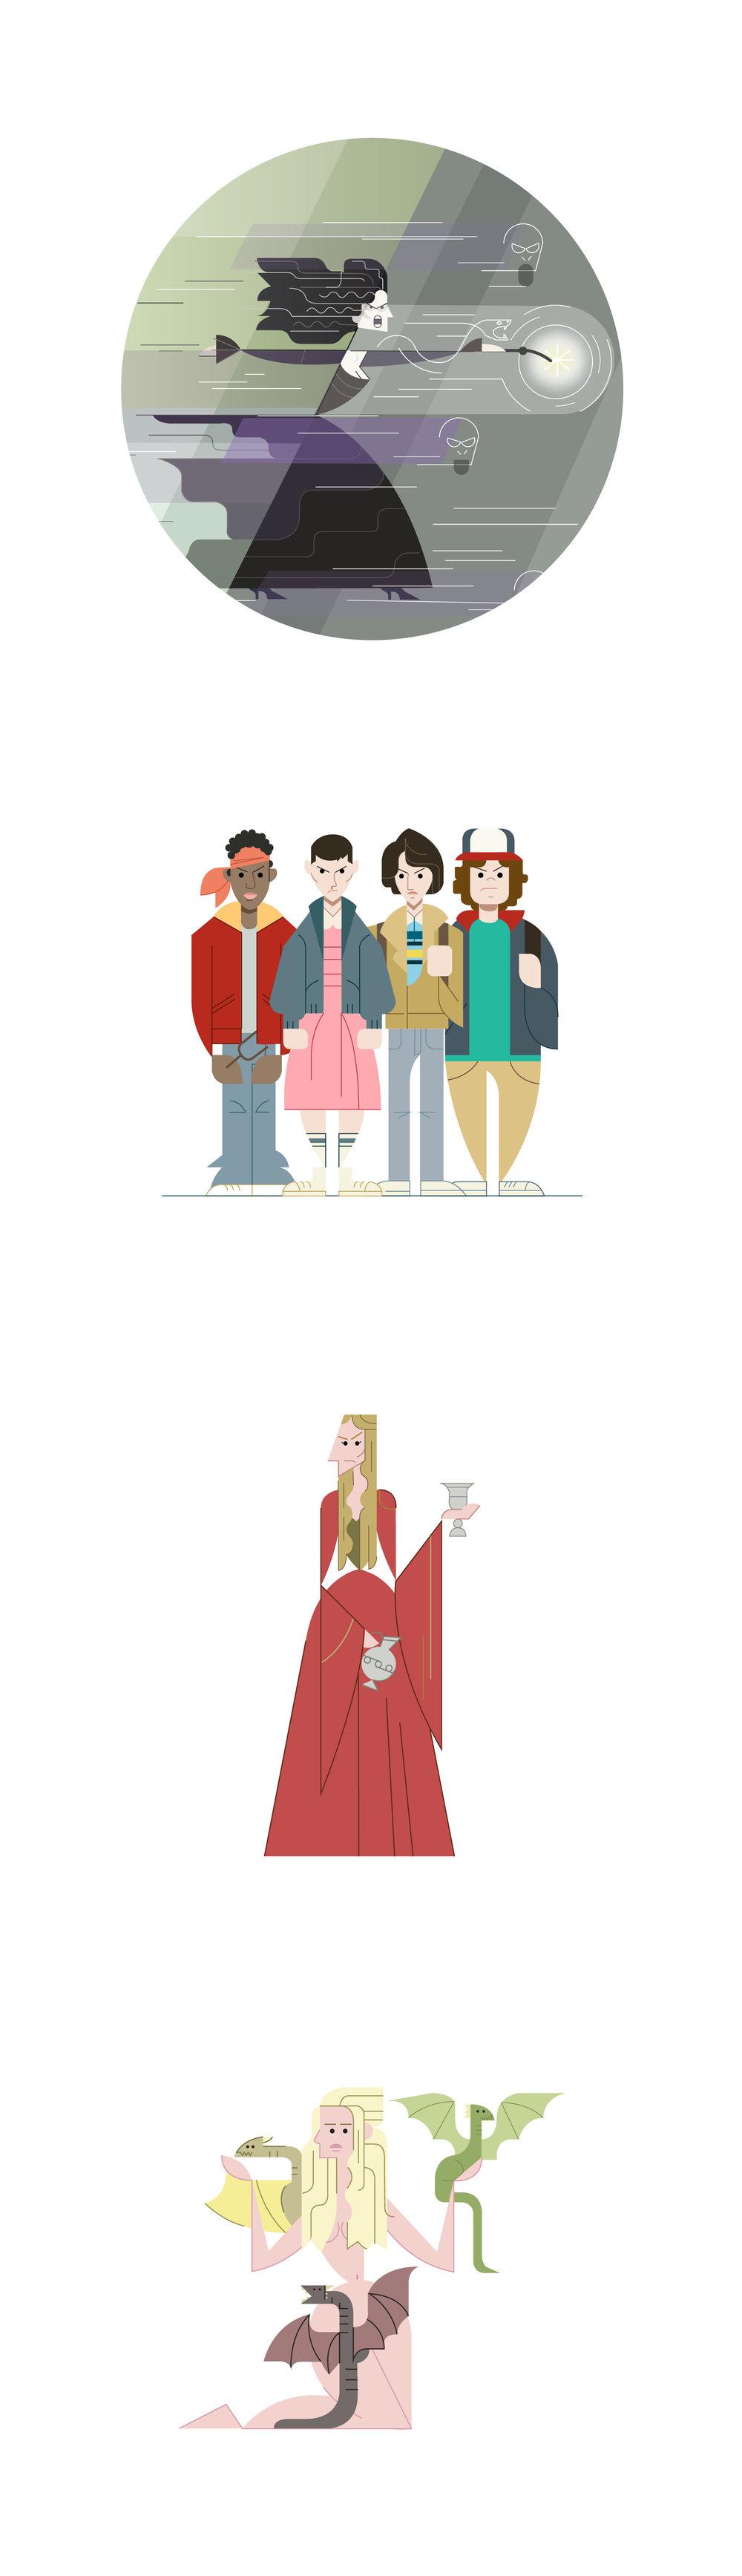 Character_design_challenge_jaime_hayde_illustration.jpg